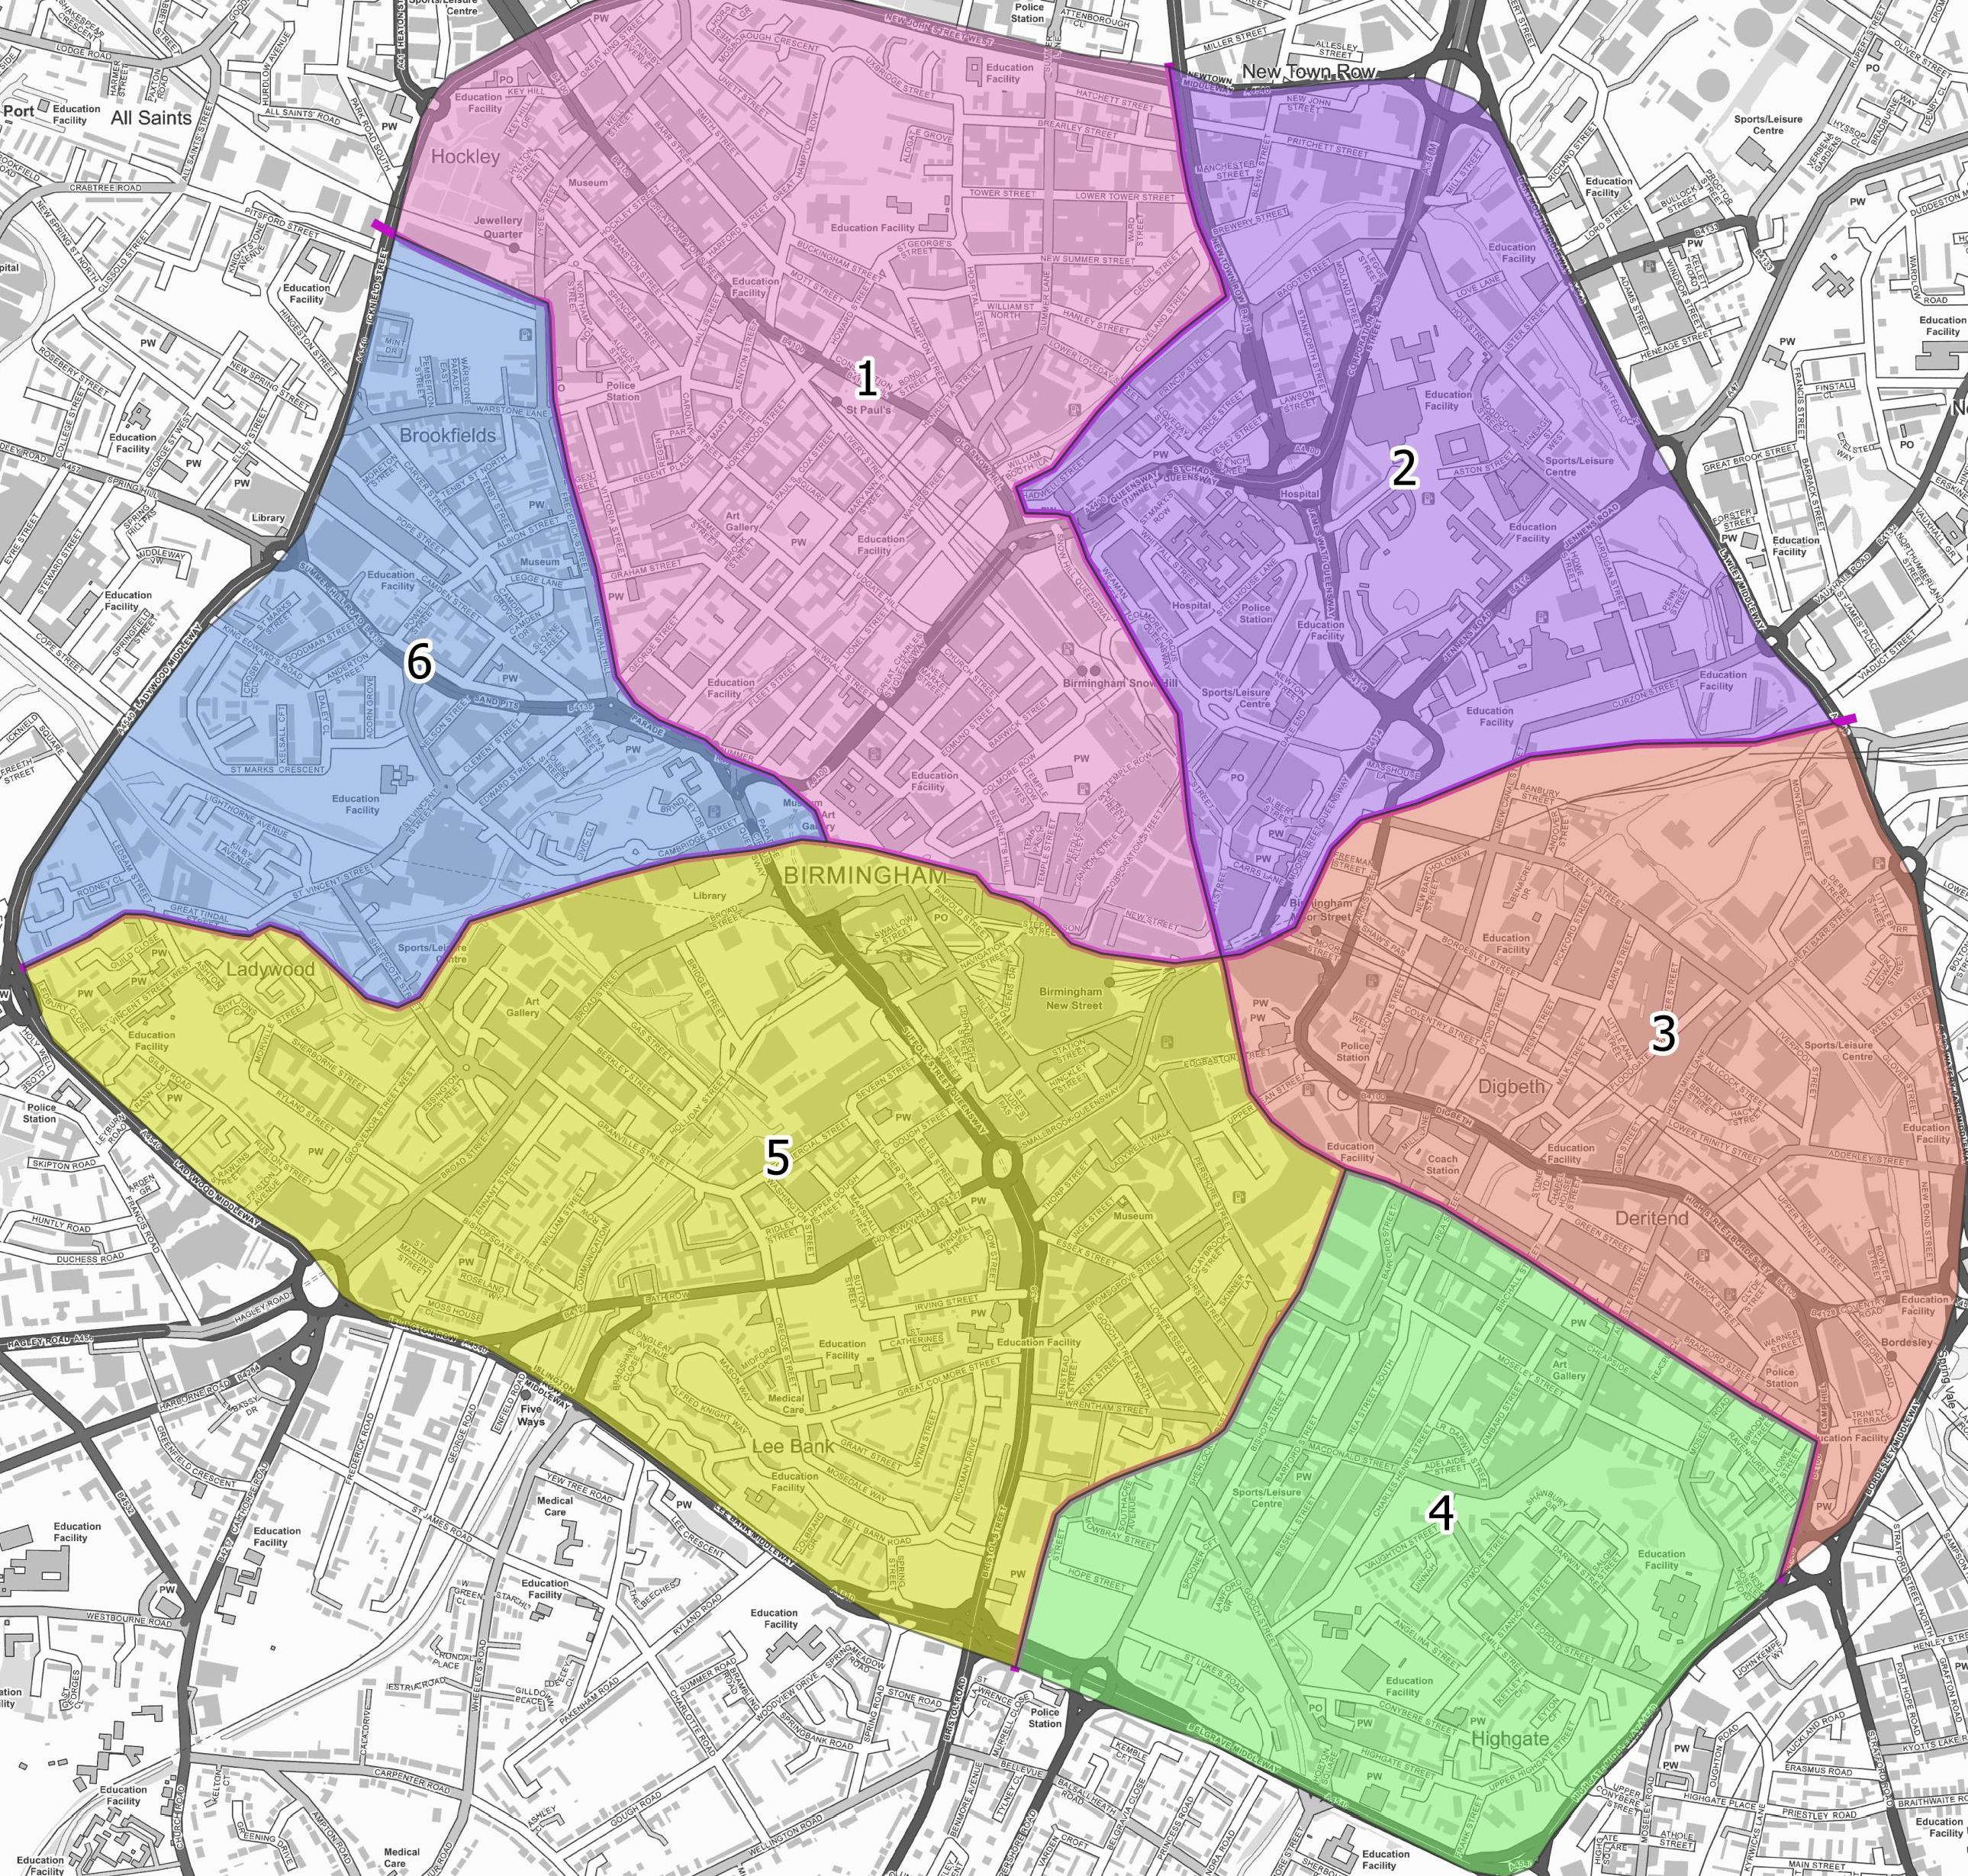 Birmingham Transport Plan